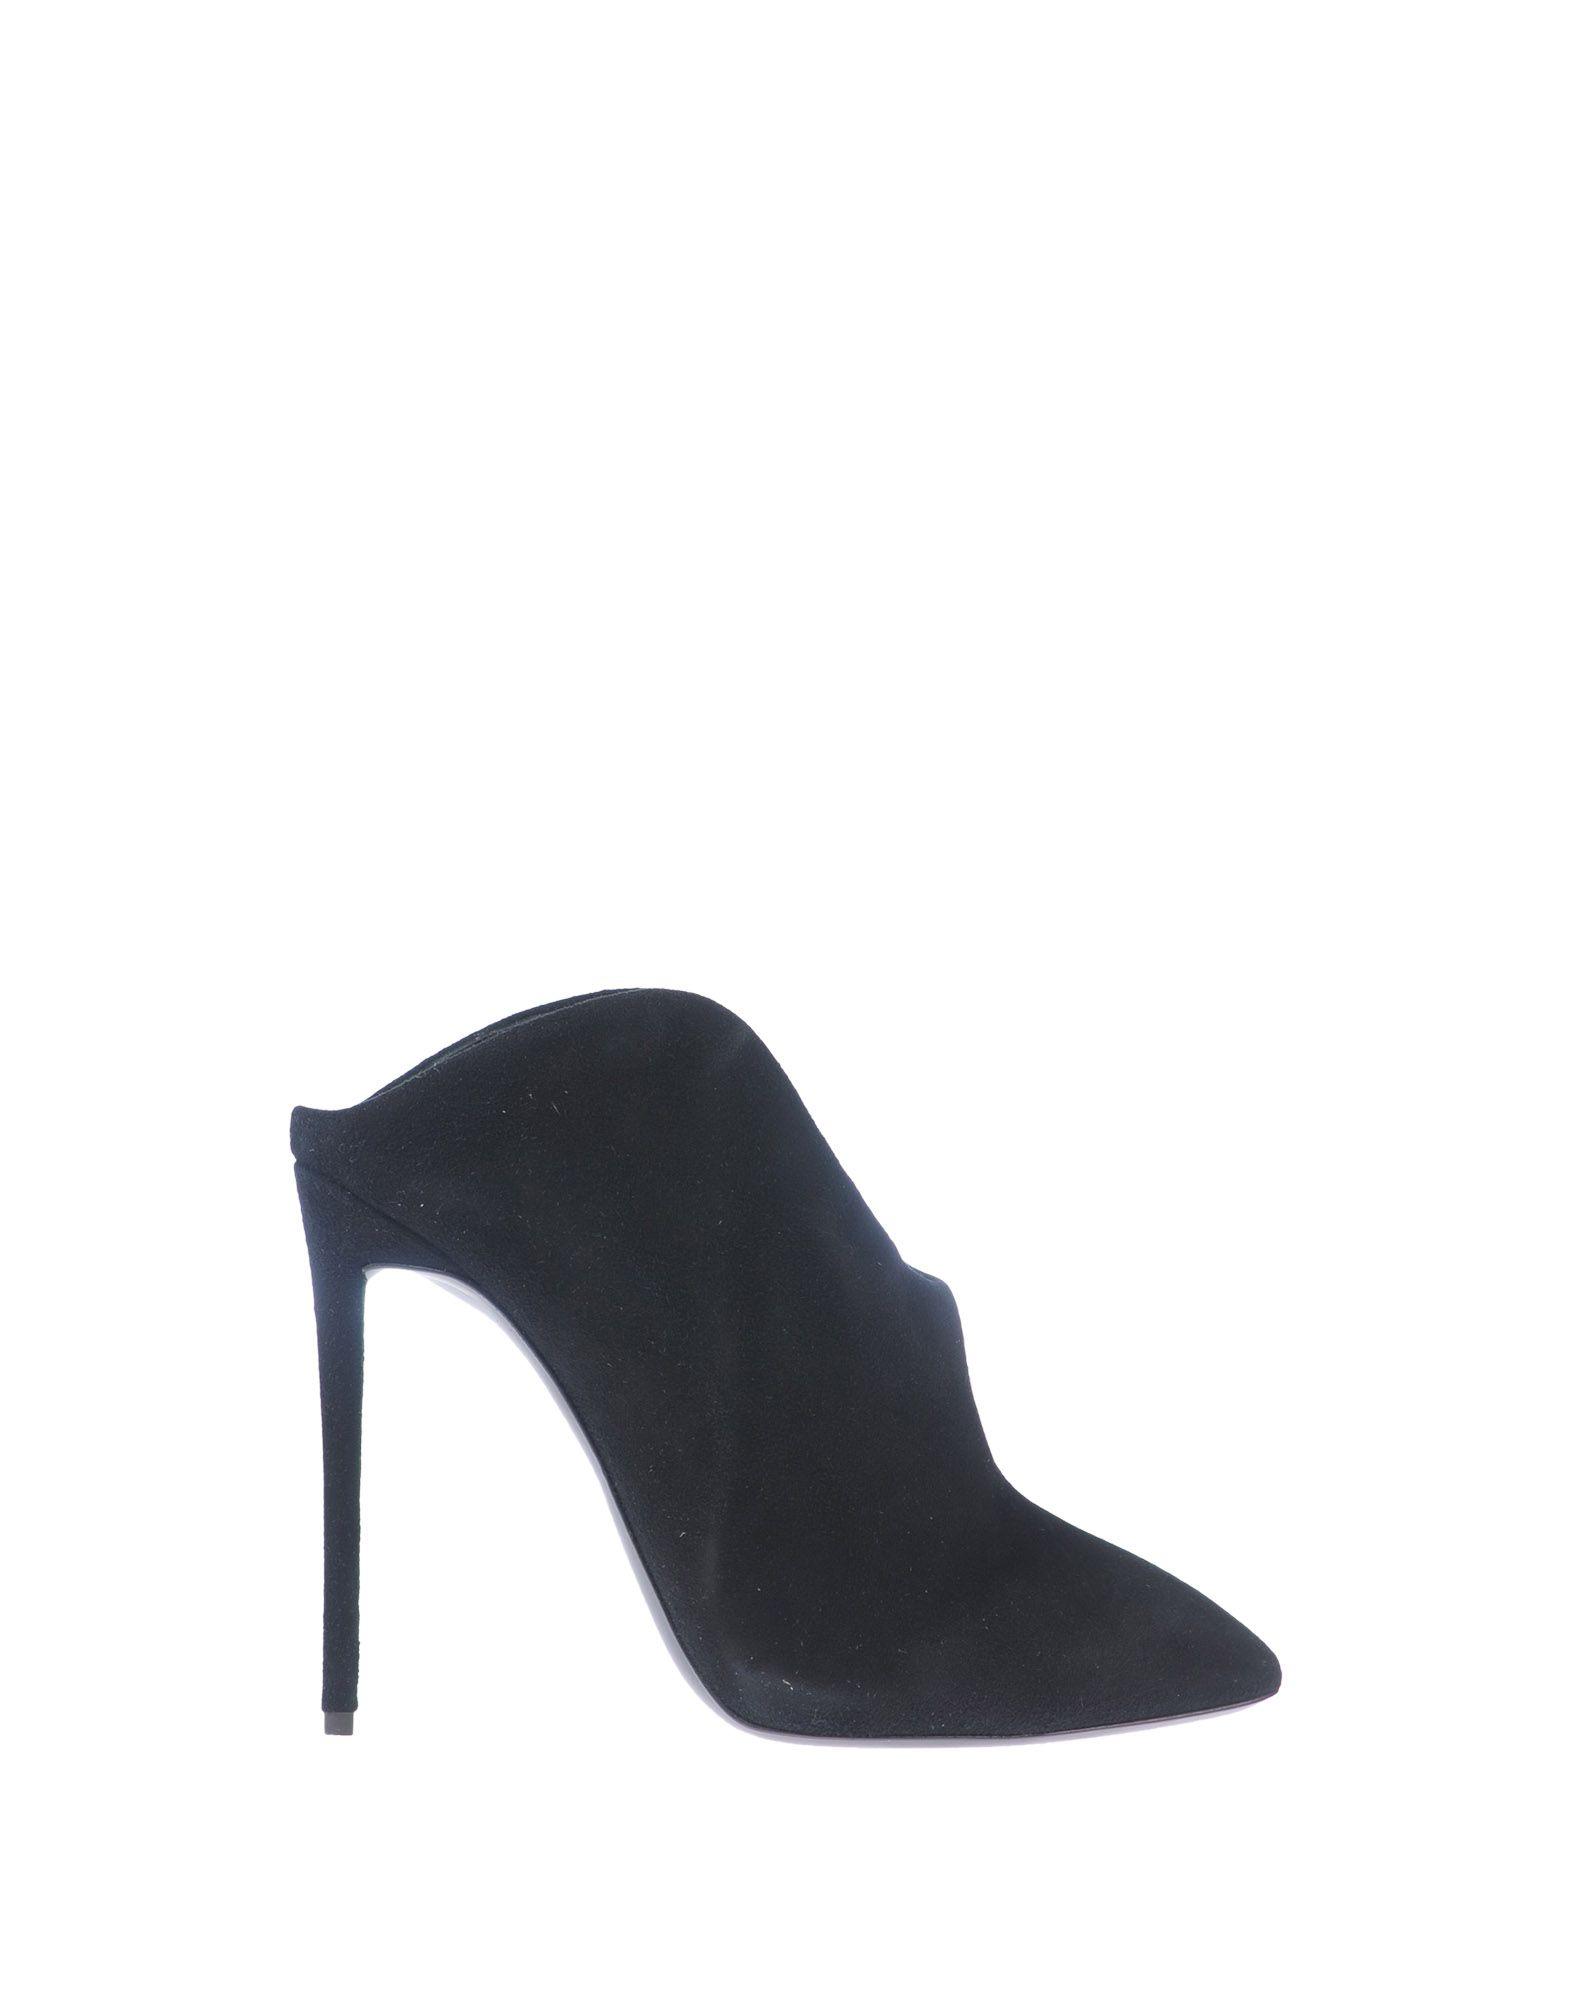 Giuseppe Zanotti strapazierfähige Pantoletten Damen  11414253HNGut aussehende strapazierfähige Zanotti Schuhe 8a9353